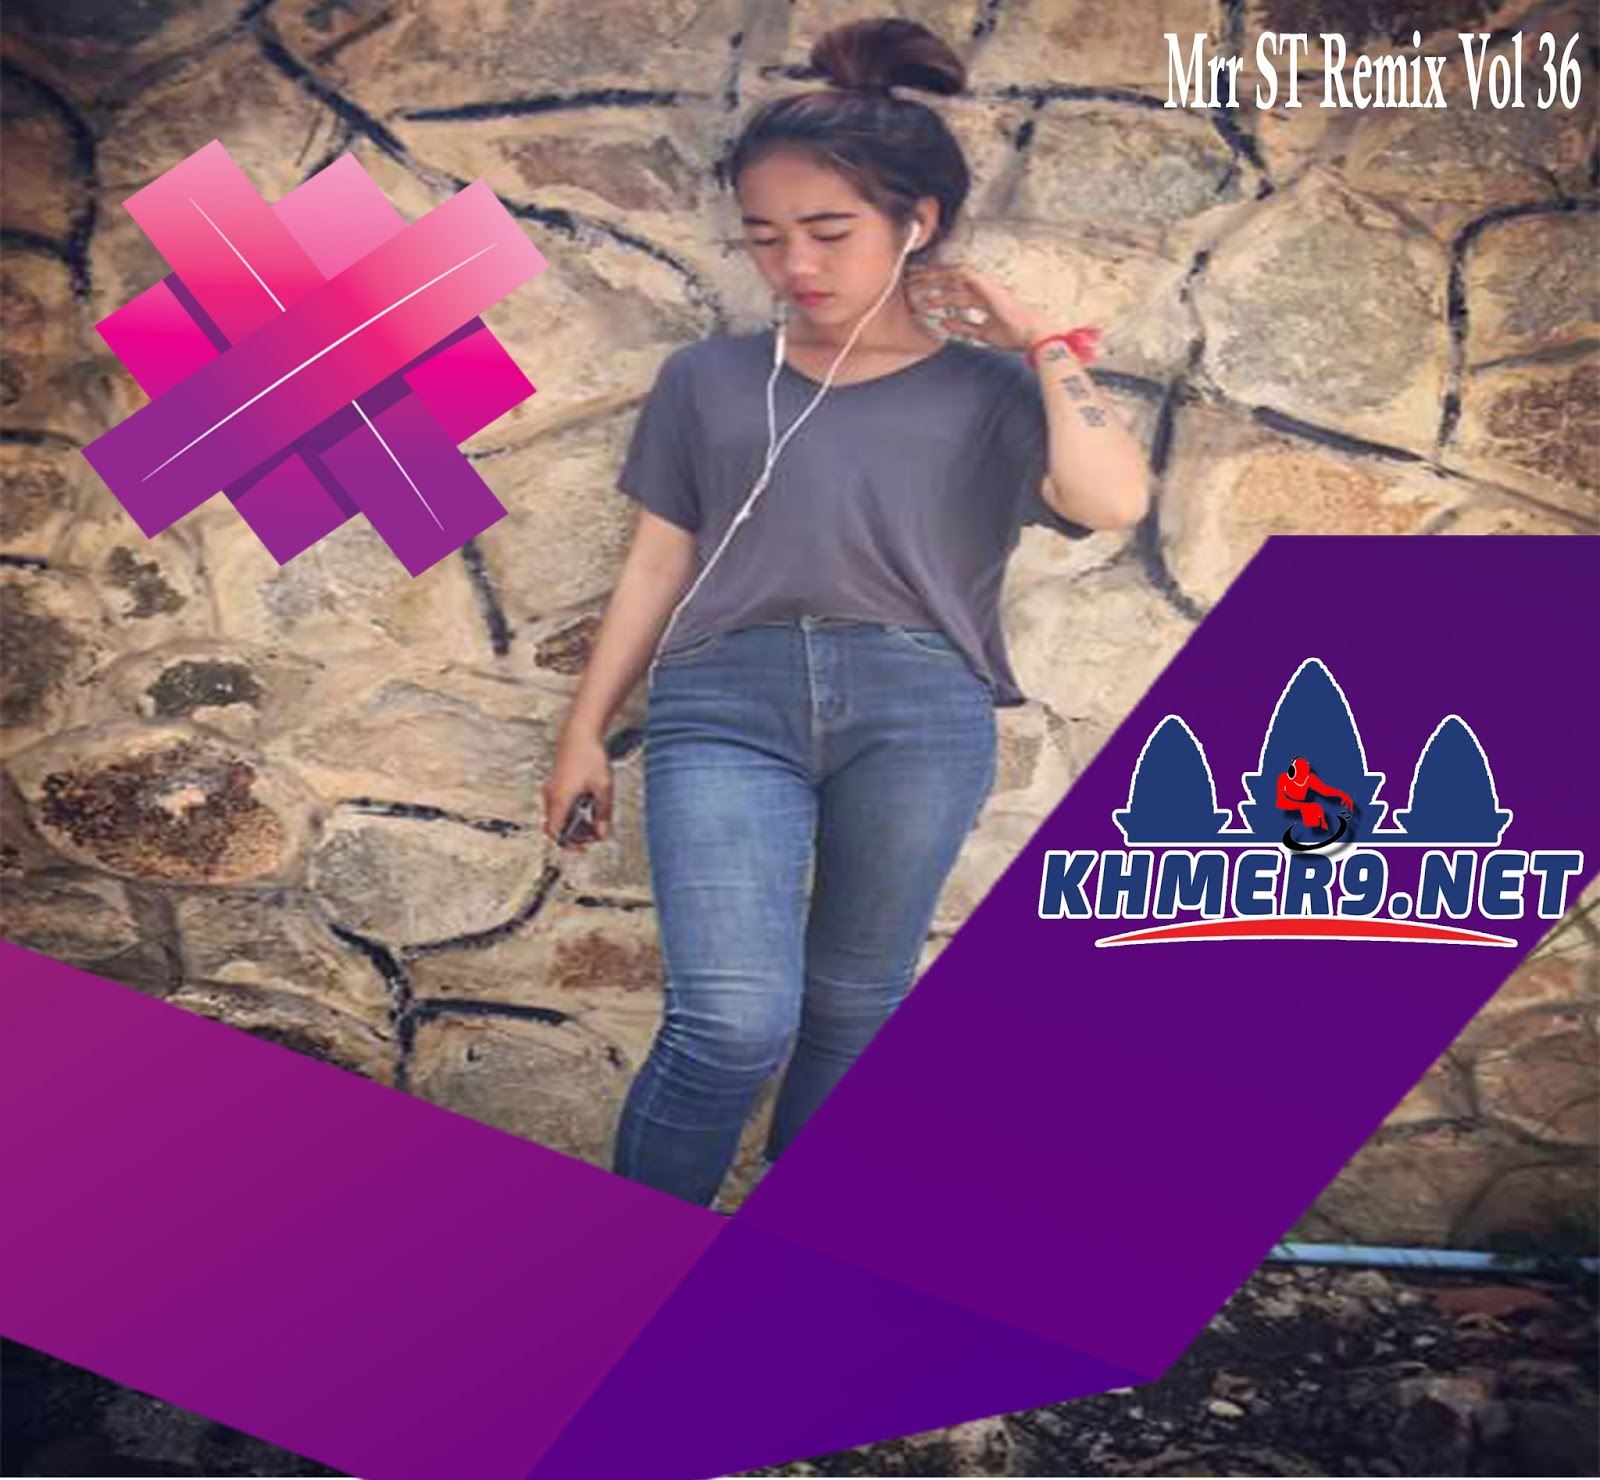 New Mashup Mp3 2018 Download: Mrr ST Remix Vol 36 - New Remix 2018